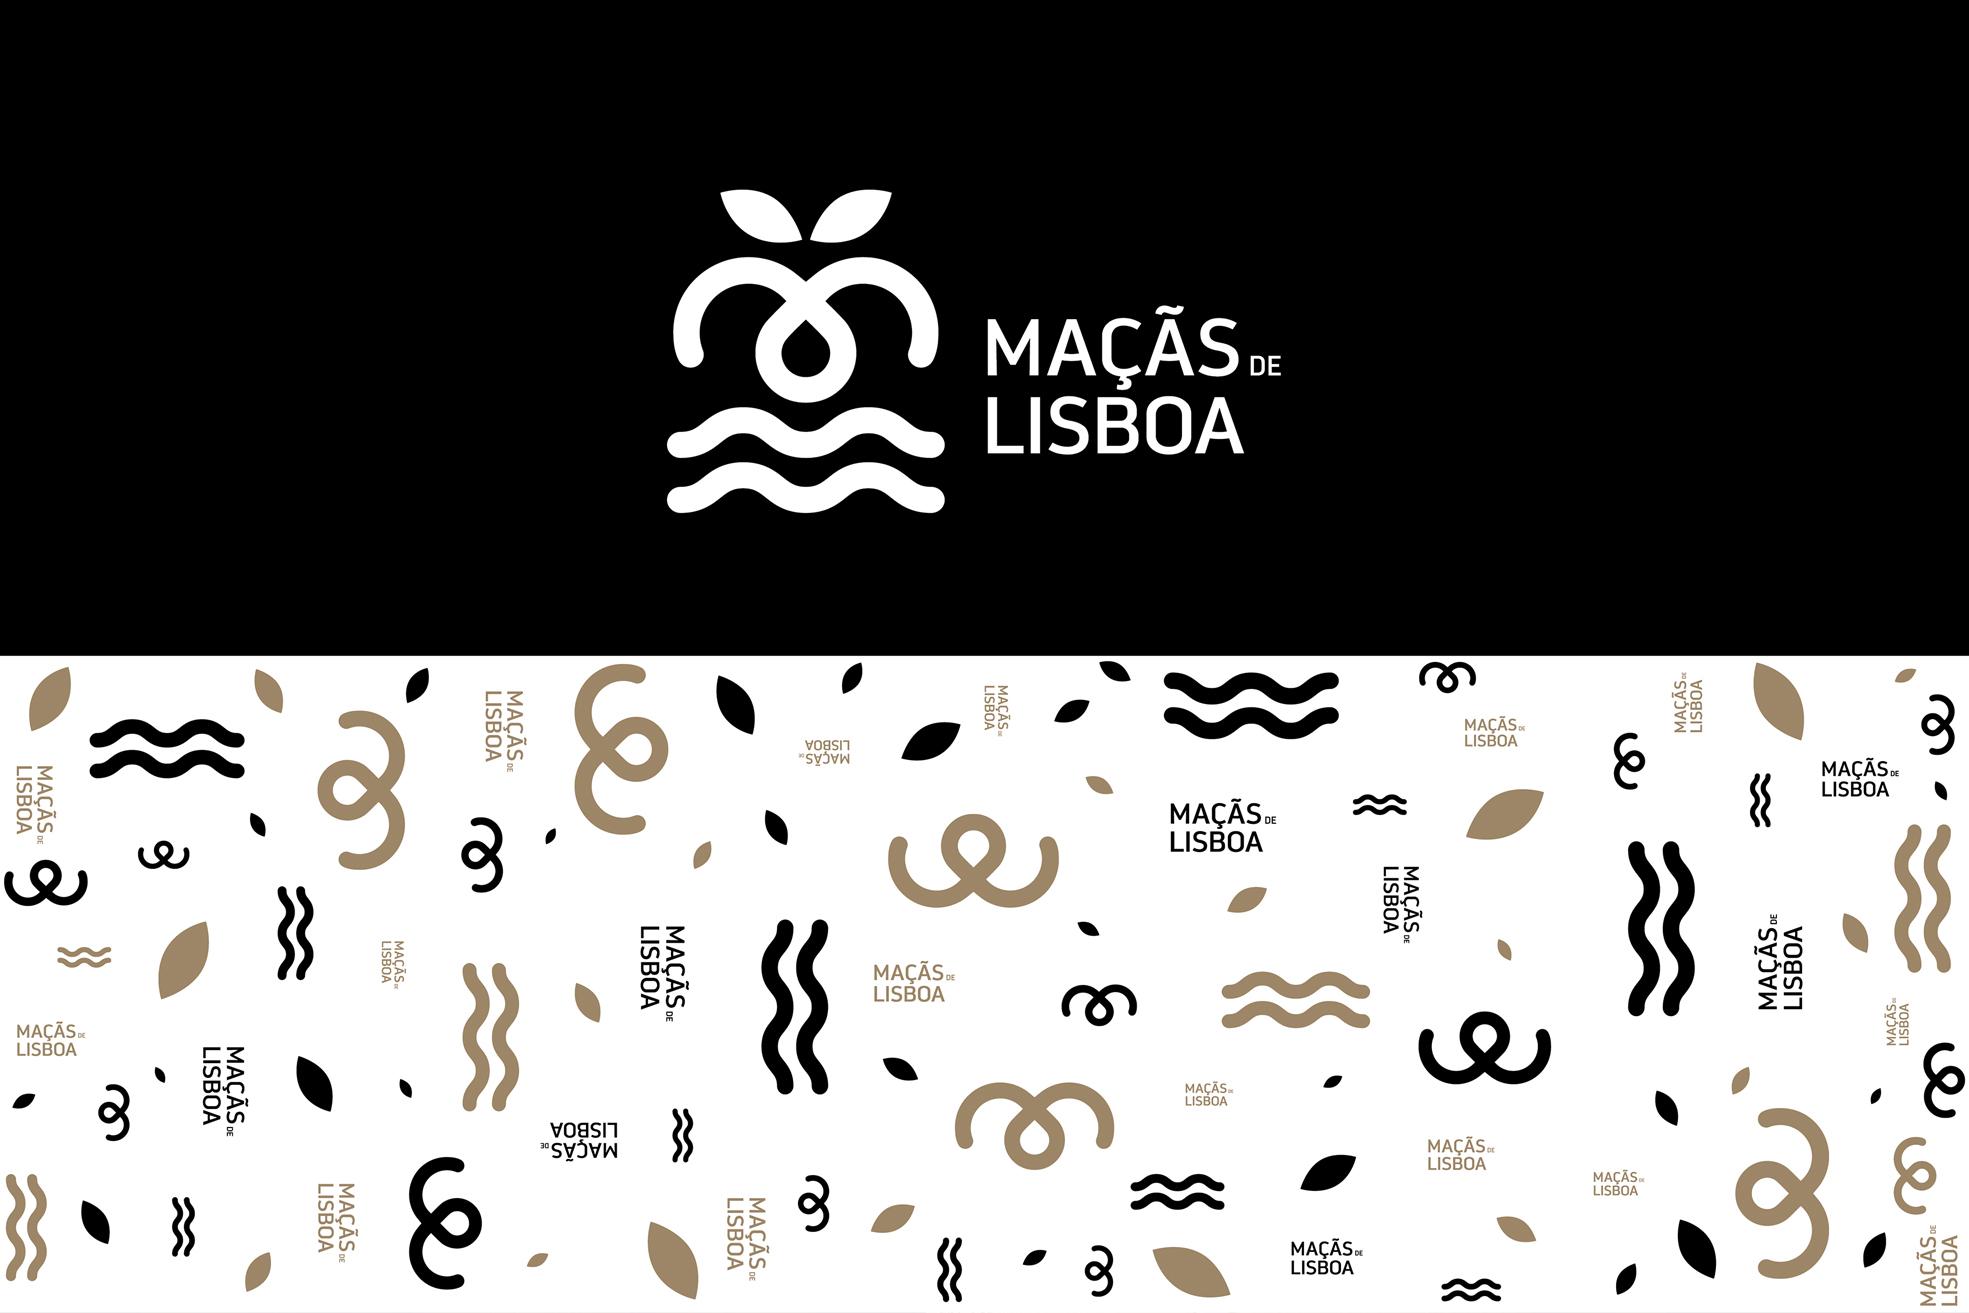 Maçãs de Lisboa by Paulo Marcelo - Creative Work - $i